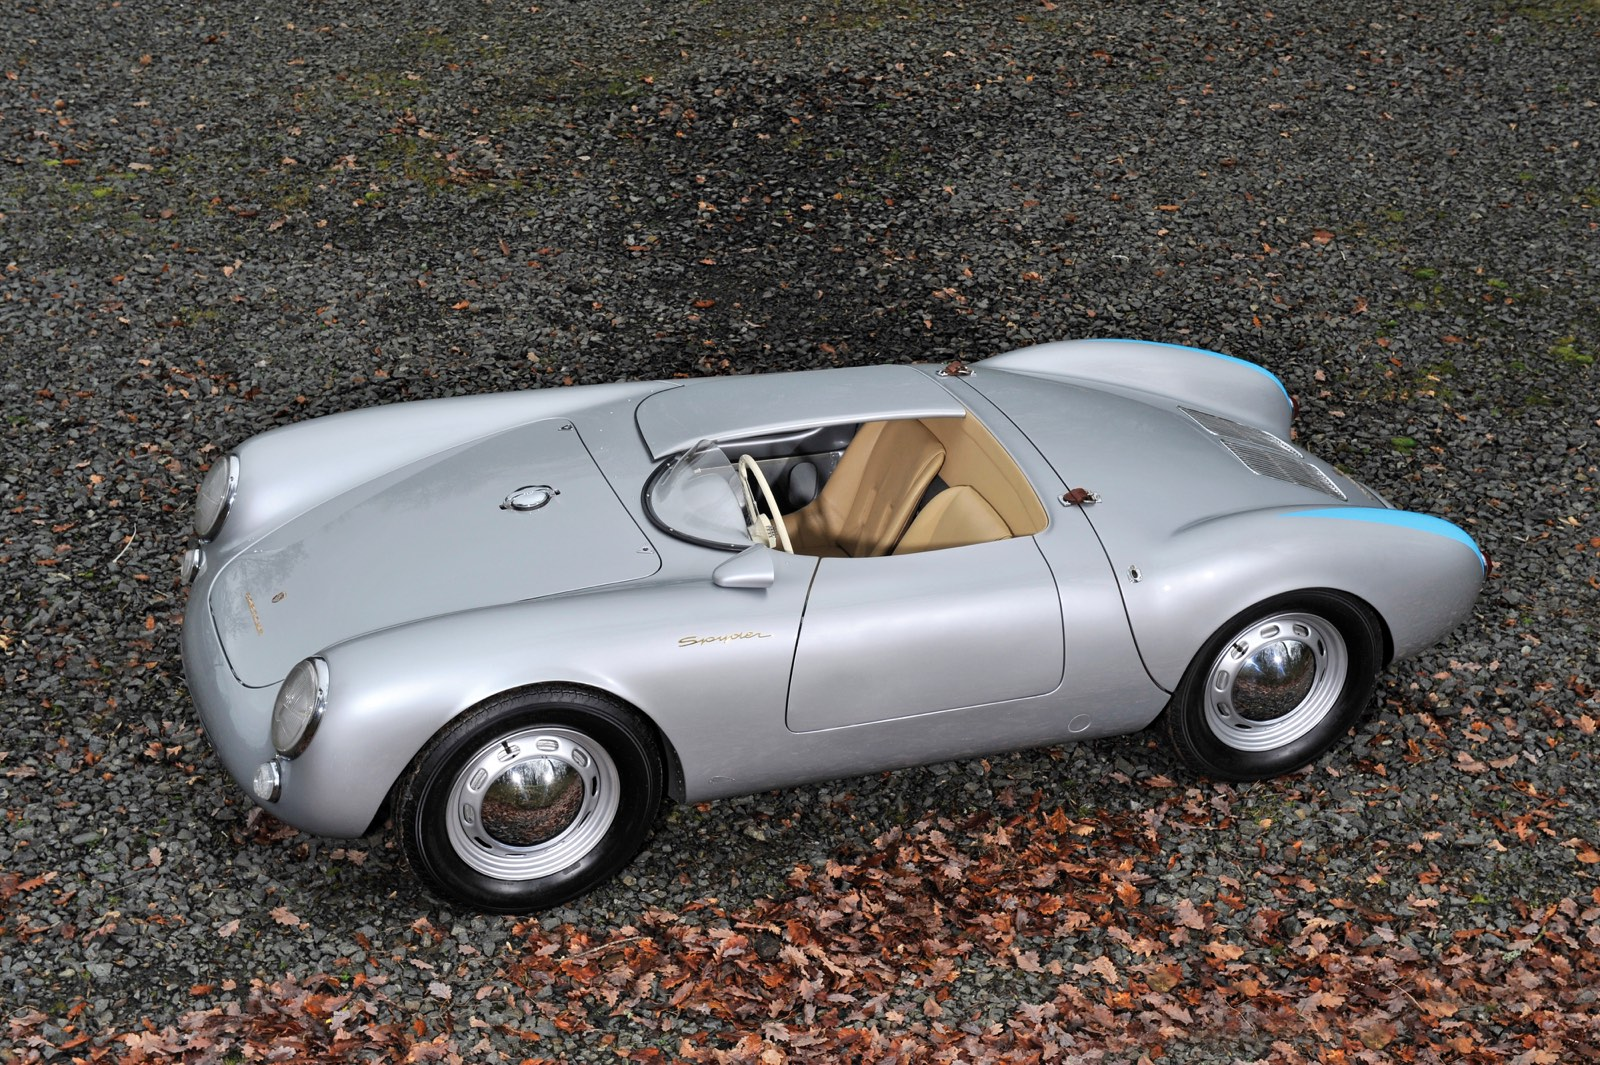 Porsche 550 Spyder with Cover